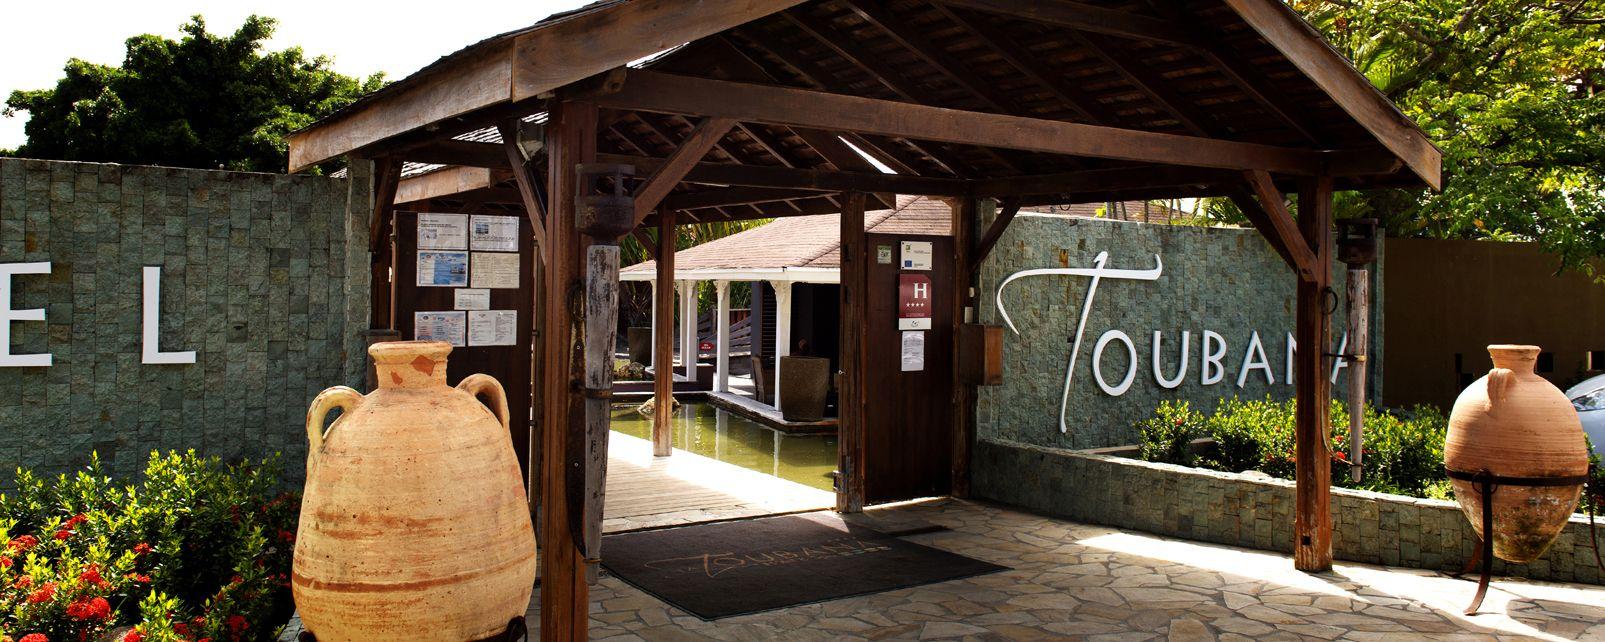 La Toubana Hotel Et Spa